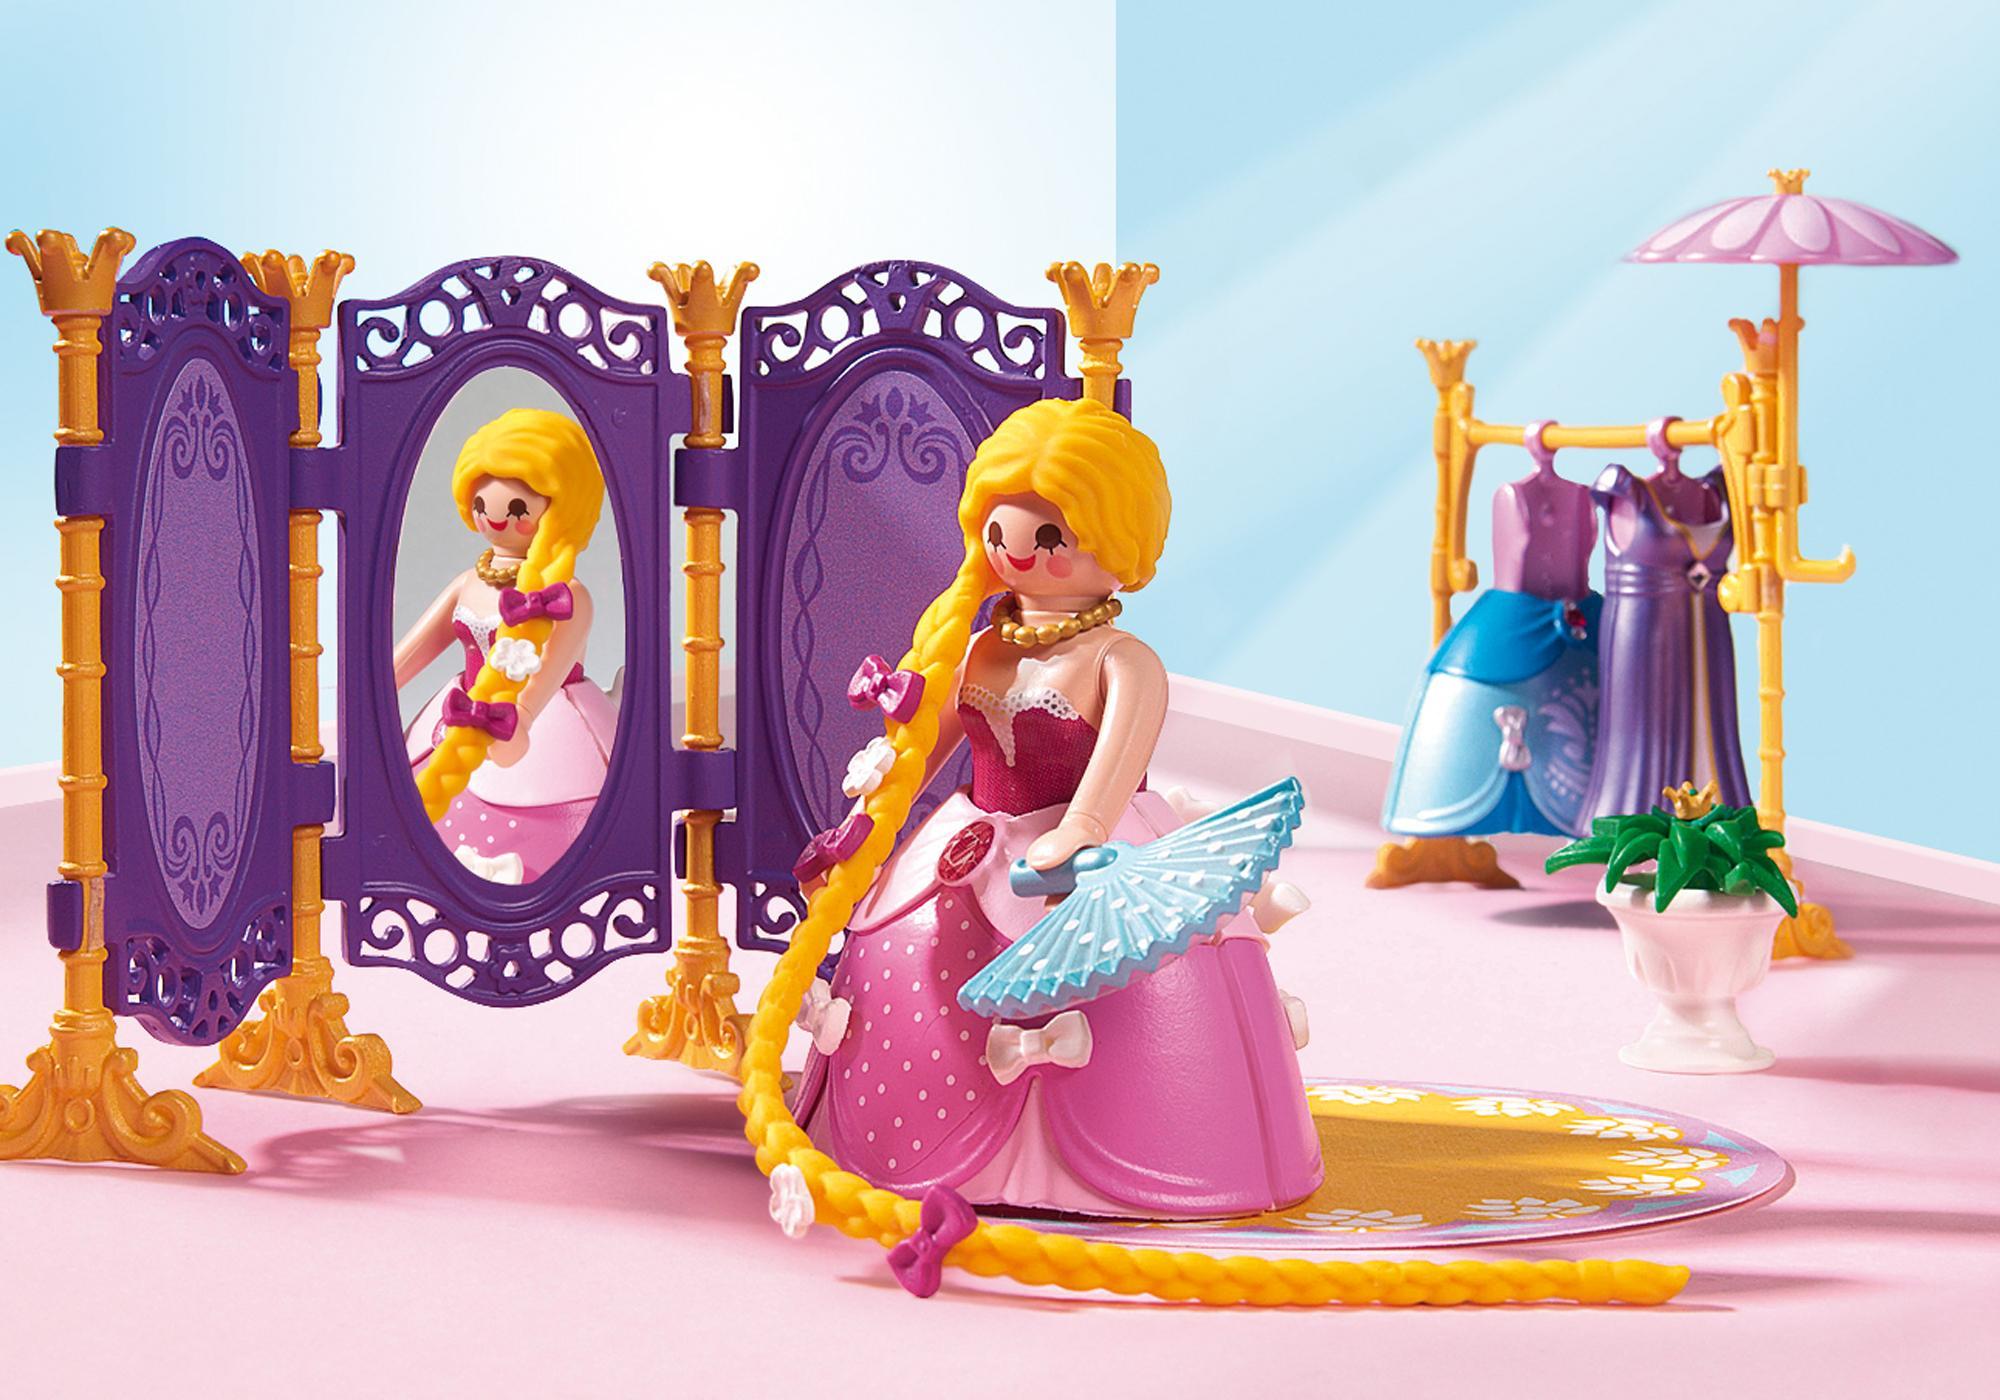 http://media.playmobil.com/i/playmobil/9158_product_extra1/Dressing Room with Salon